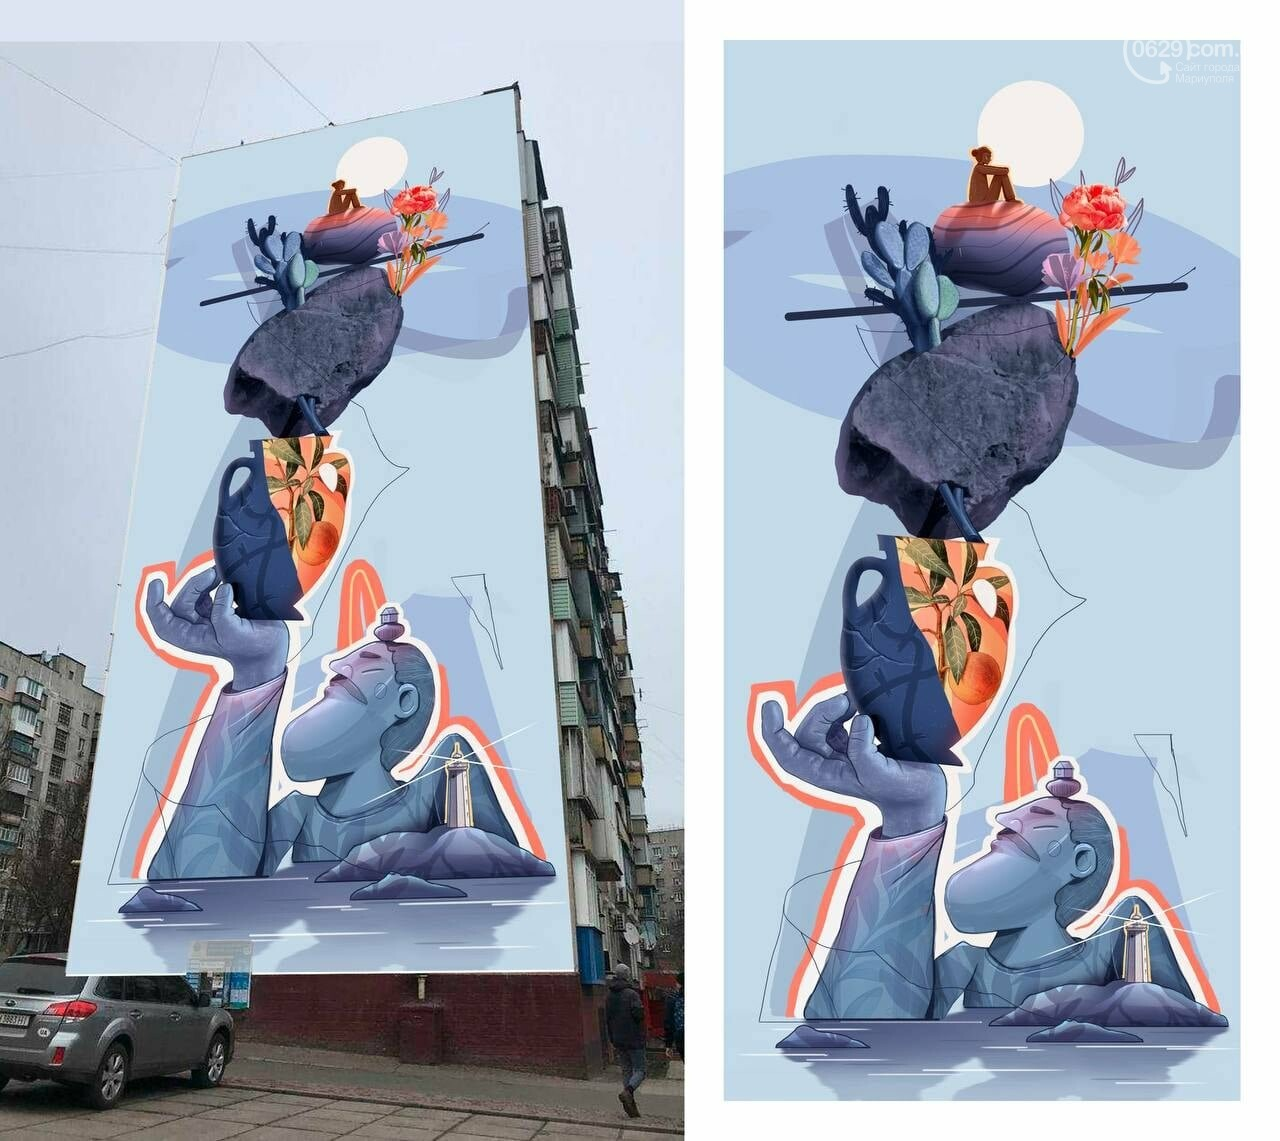 В Мариуполе ищут место для нового мурала,- ФОТО, фото-1